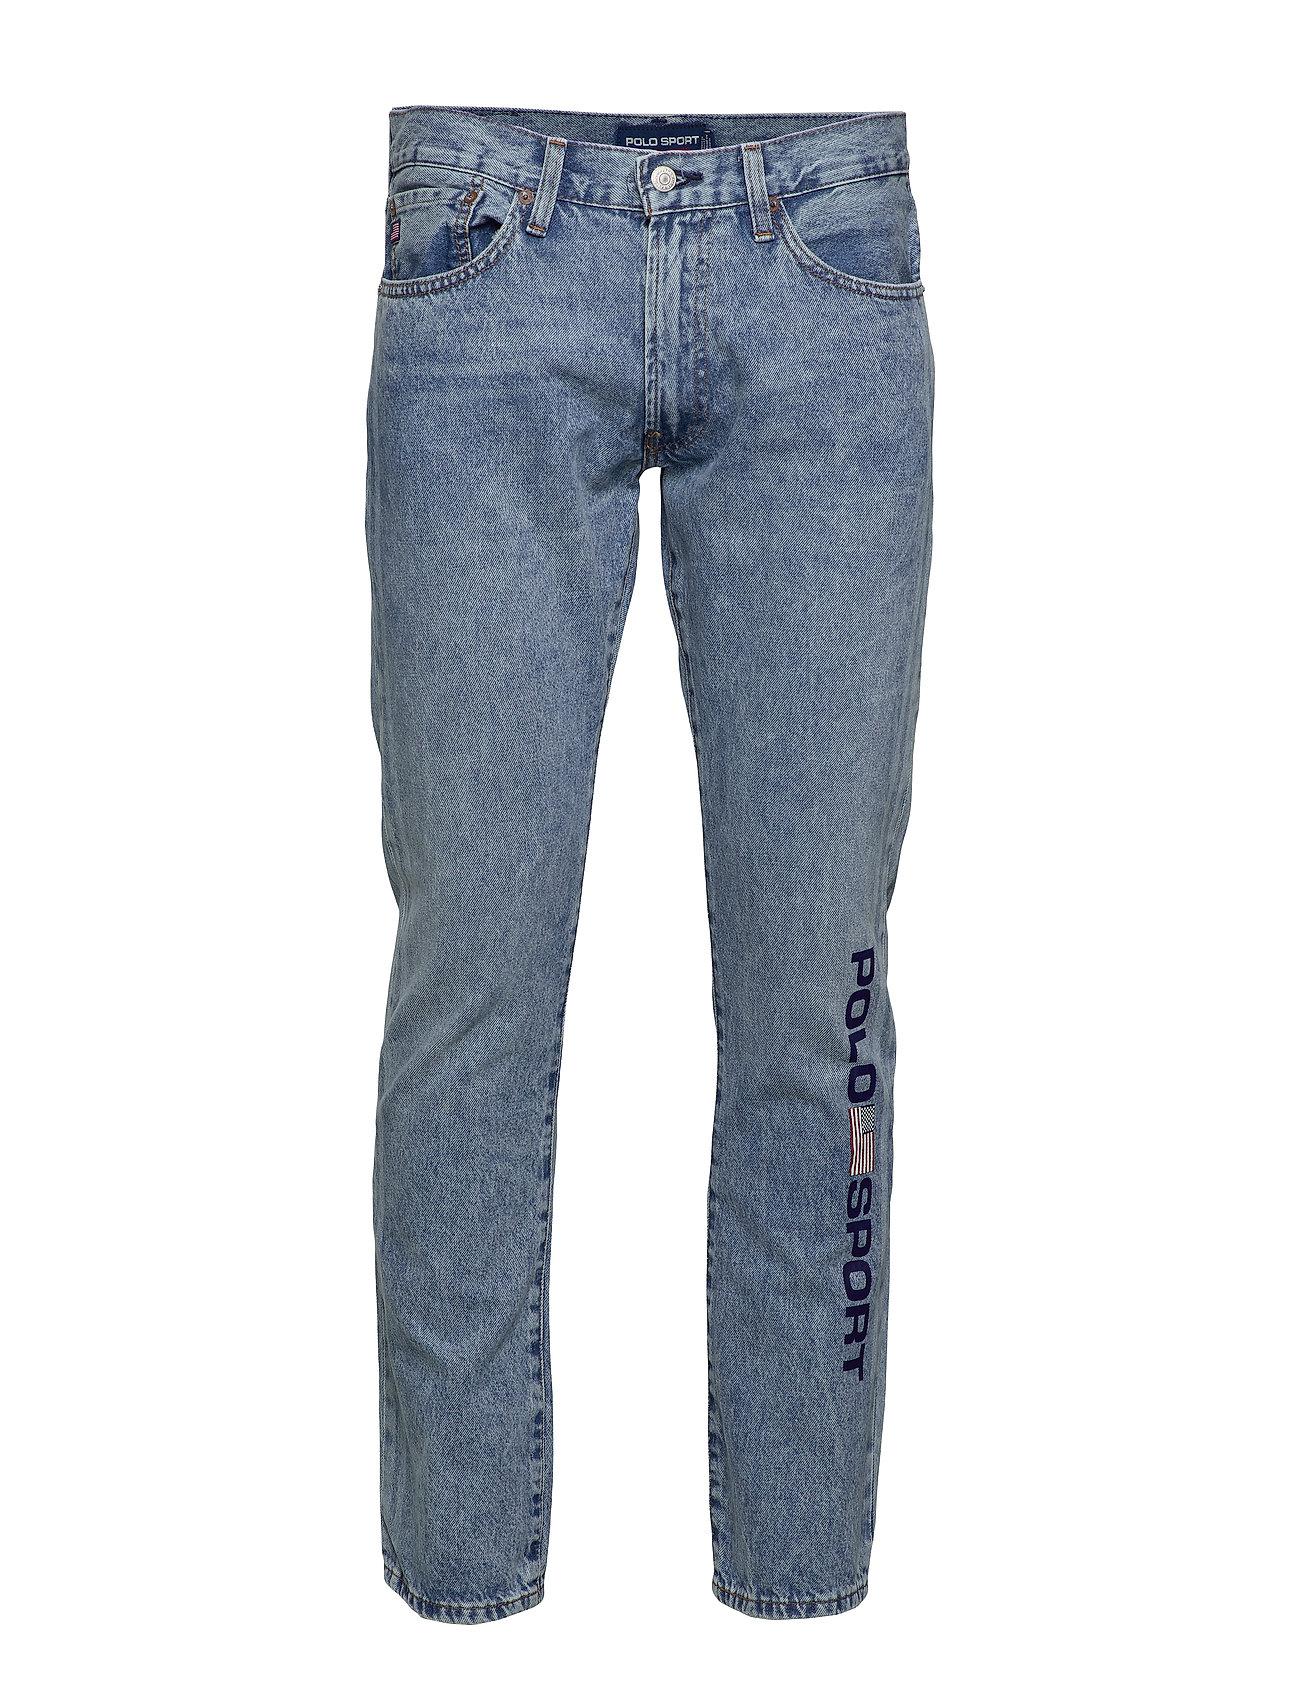 Polo Ralph Lauren Varick Slim Straight Jean - LEIGHTONS